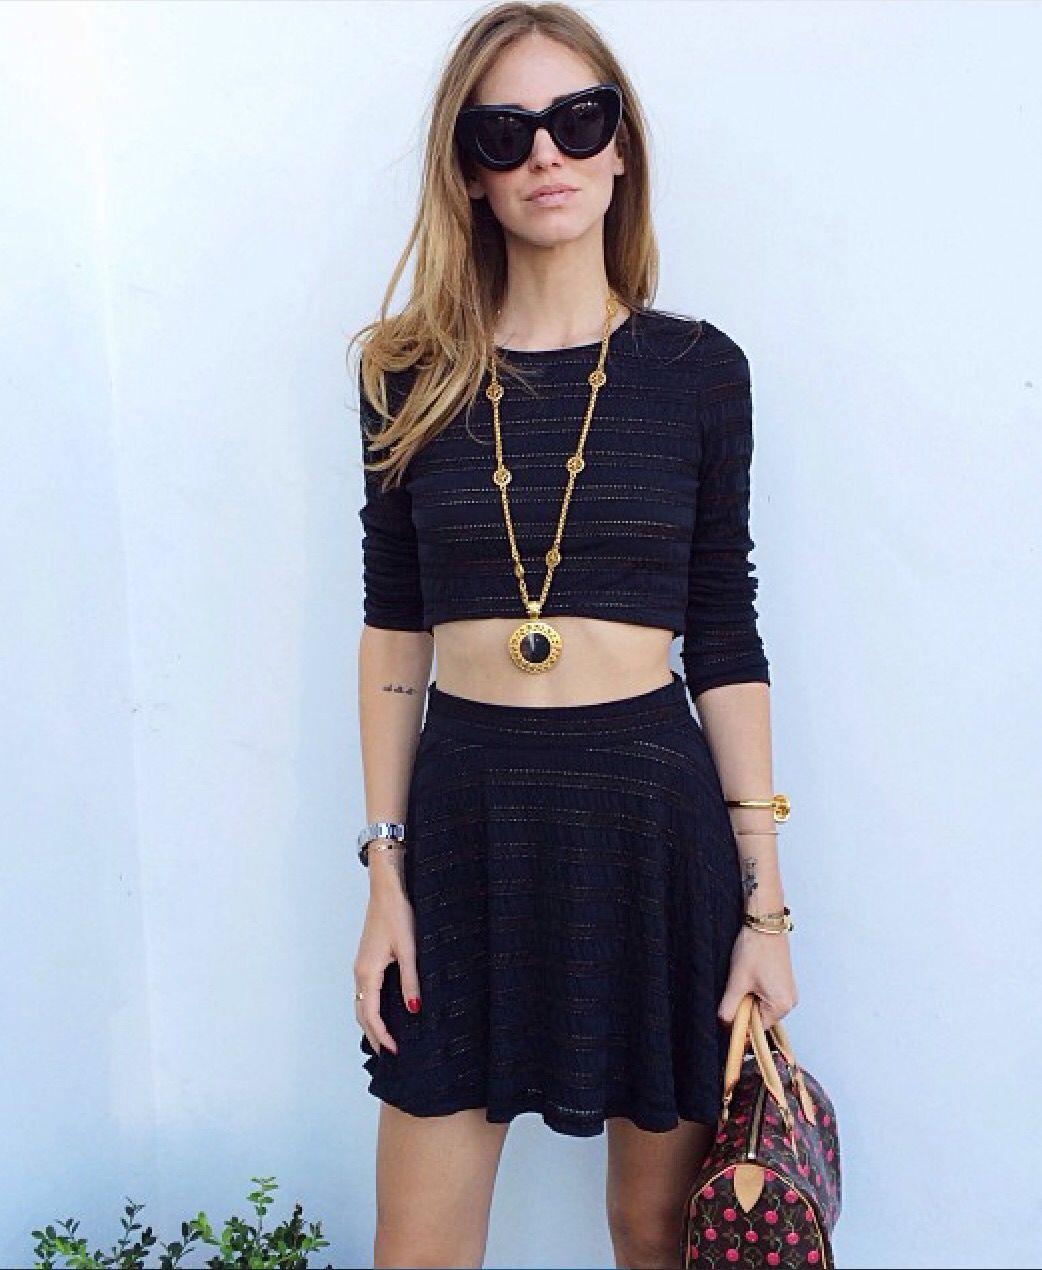 Chiara Ferragni ❤️ italian style It girl Chic sty Lovely street style Fashion addict